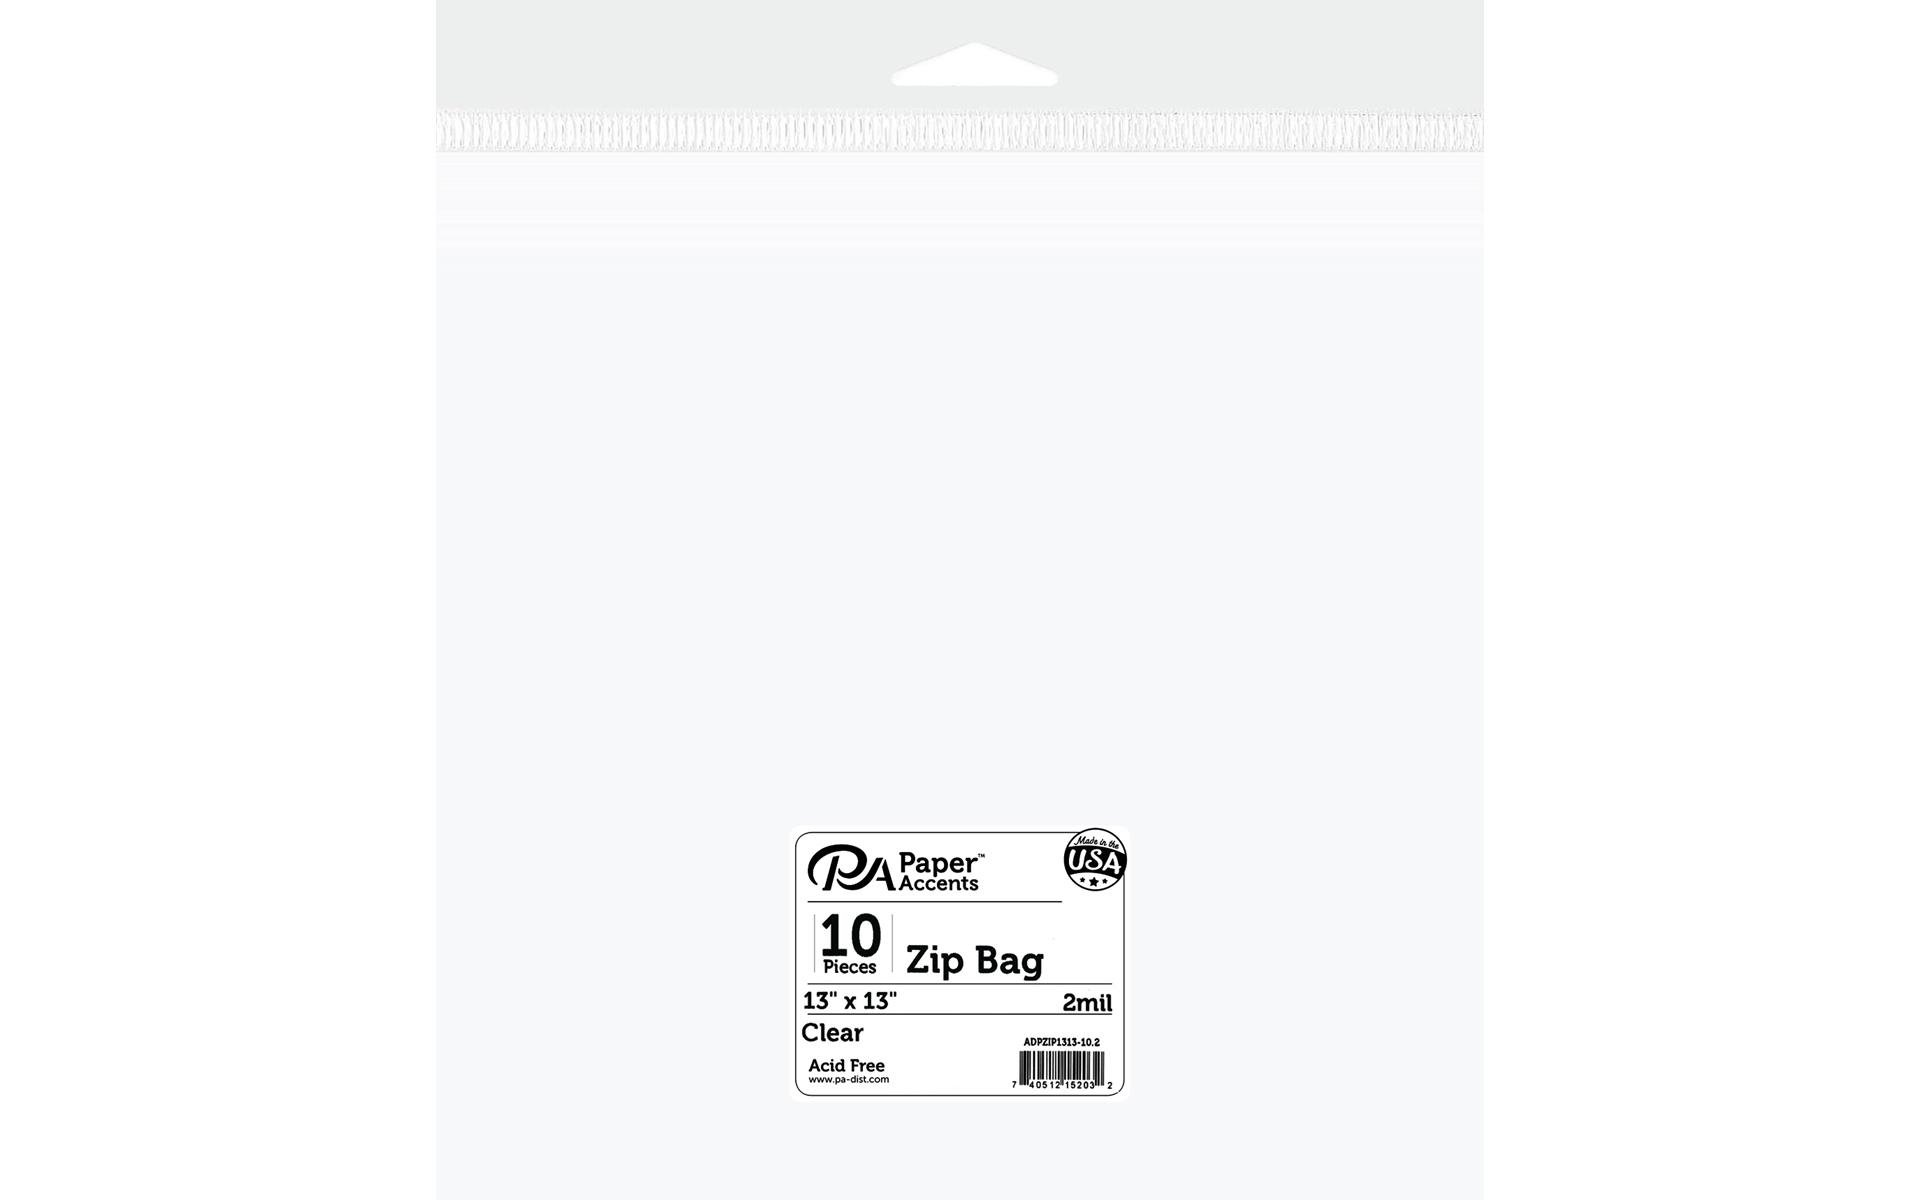 Paper Accents Bag Zip 13x13 10pc 2mil Clear